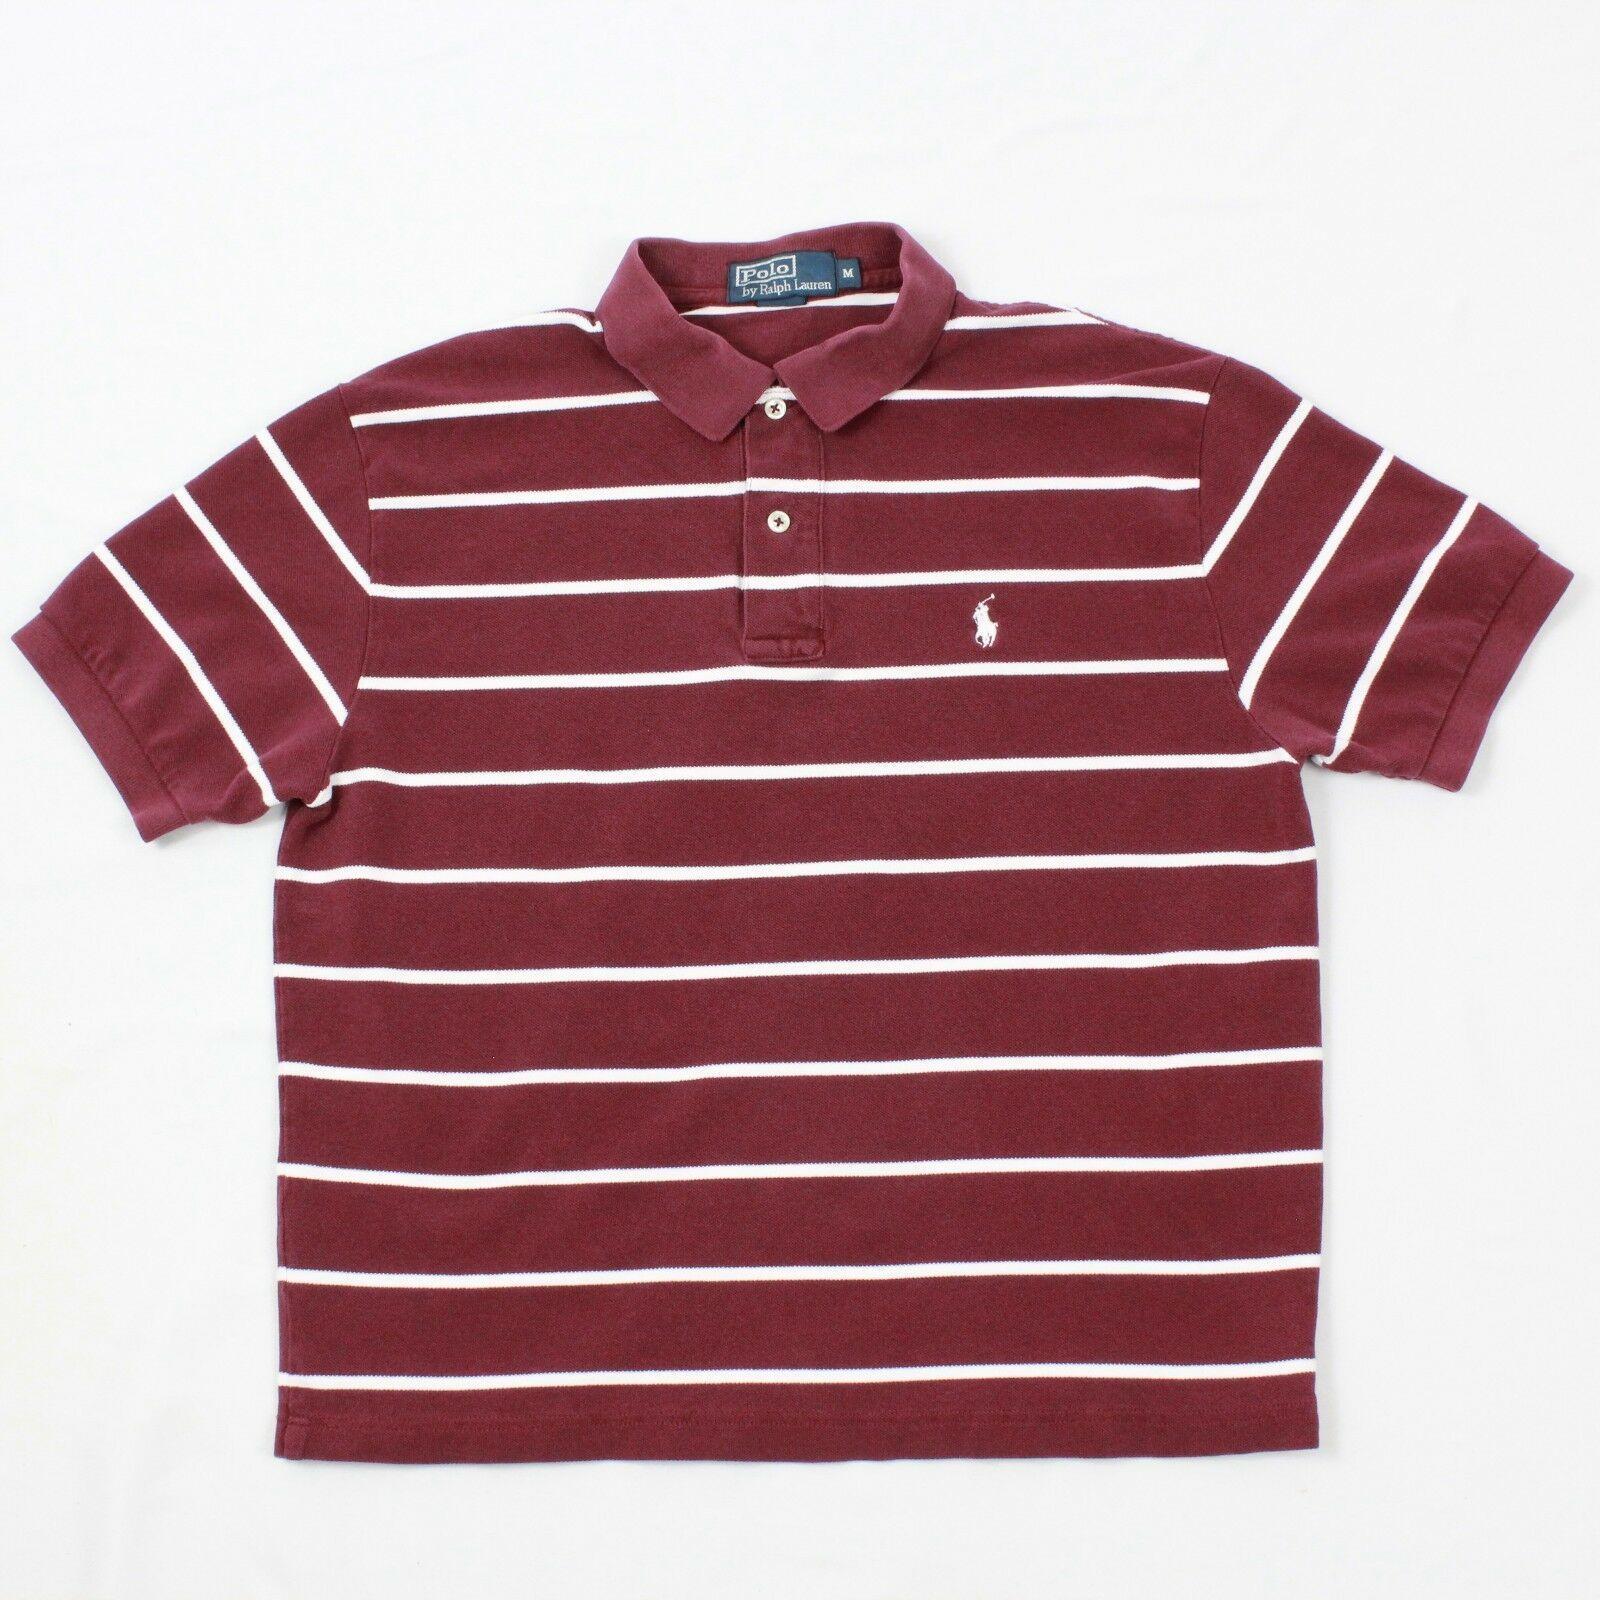 Polo Rayé TAILLE M Ralph Lauren Coton Burgun Blanc Cheval T-Shirt Extensible